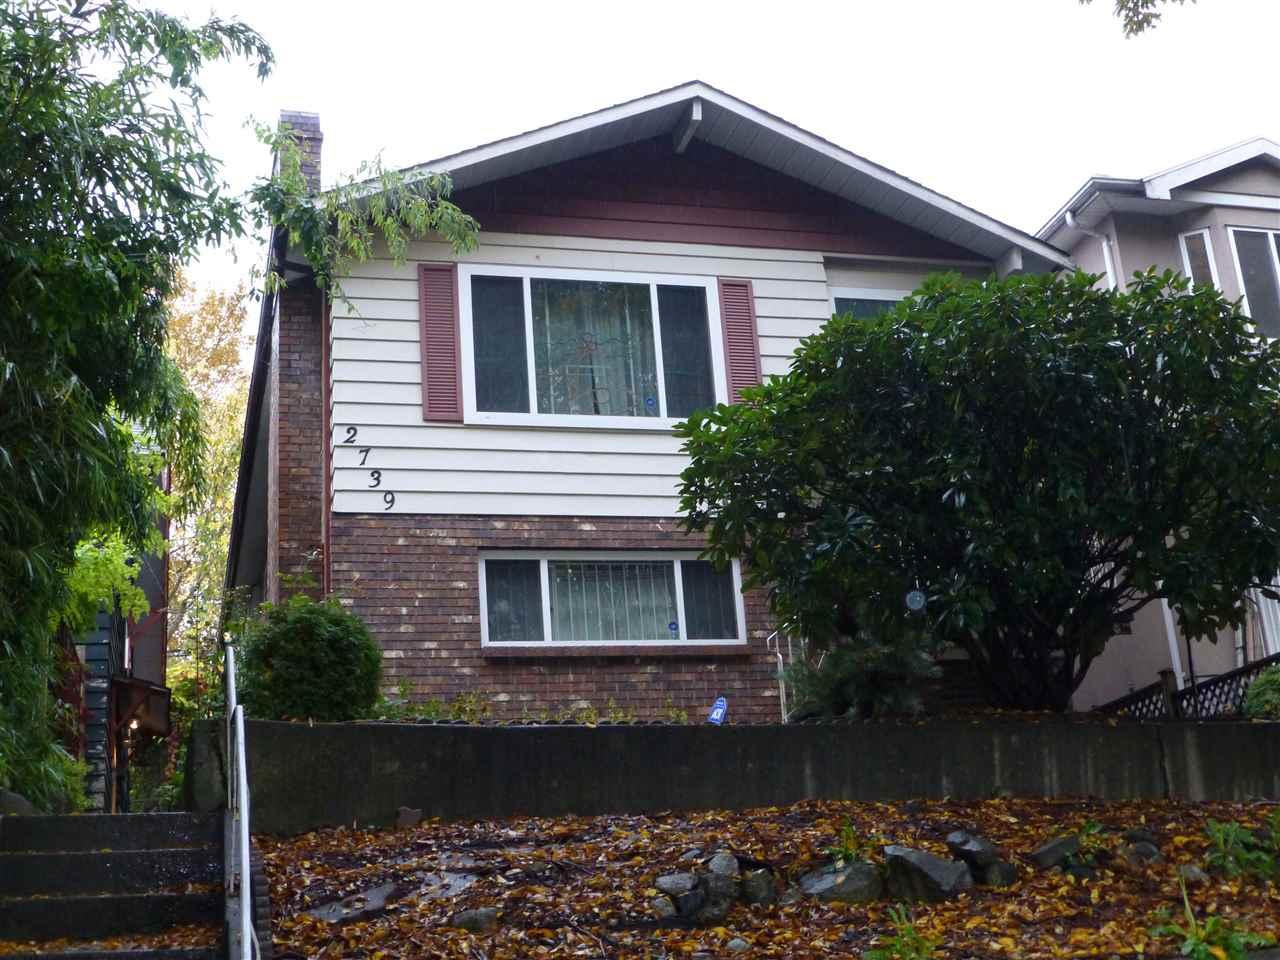 2739 E BROADWAY, Vancouver, BC V5M 1Y7